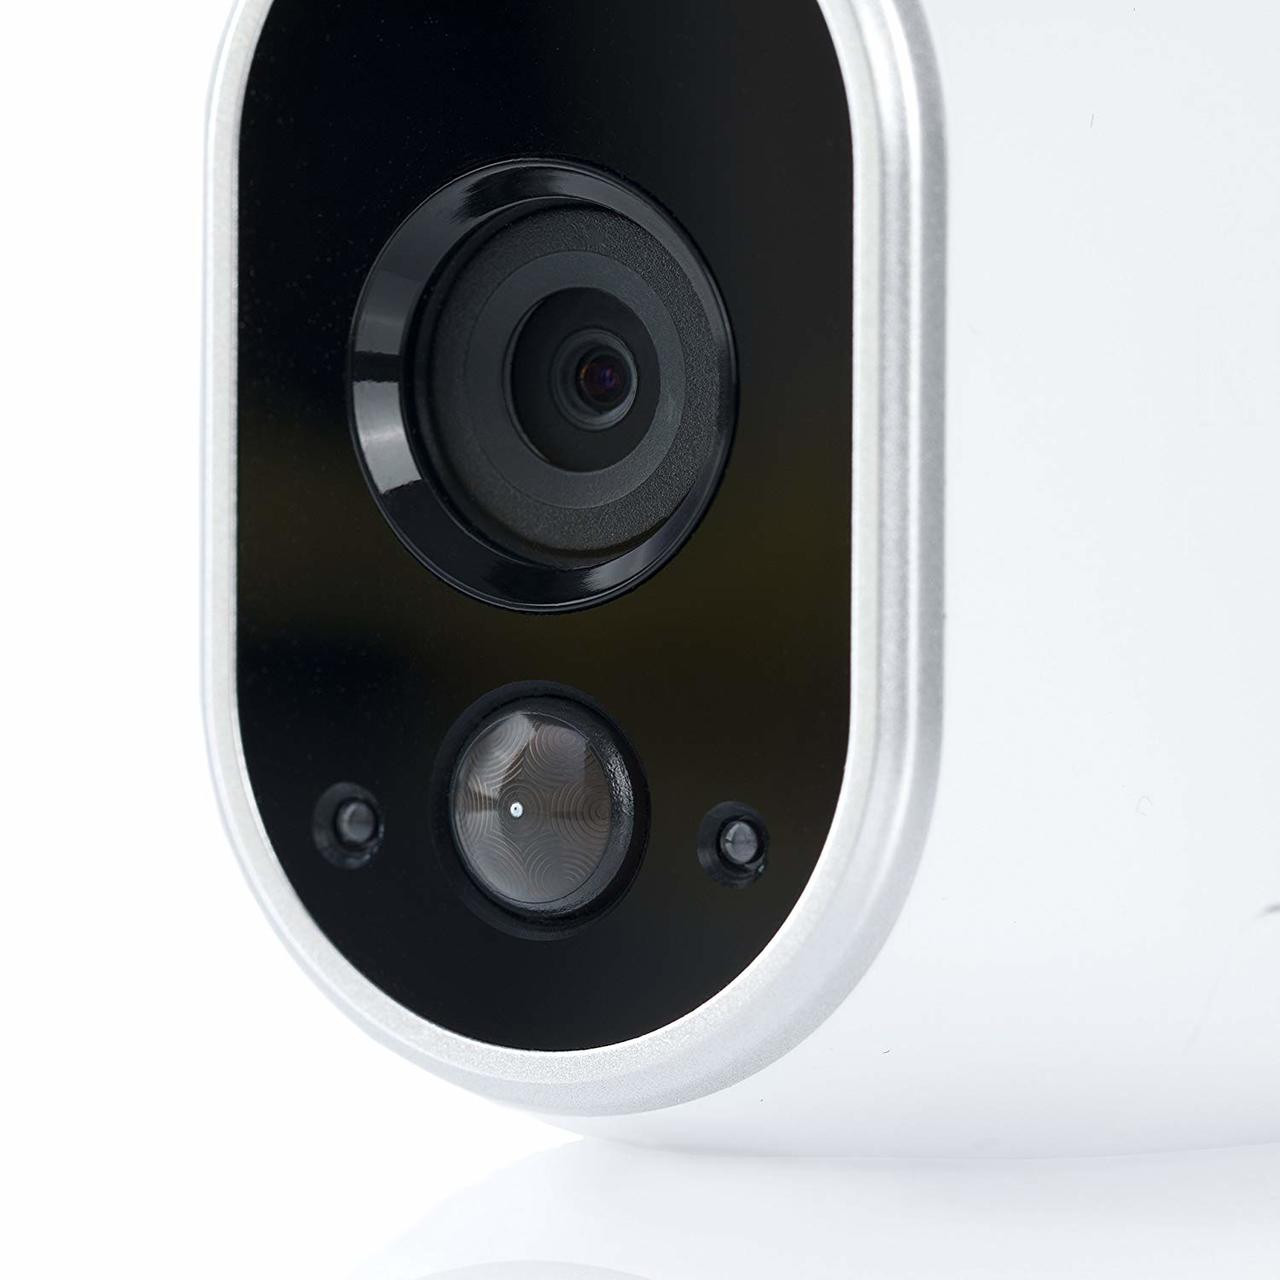 Arlo VMS3630B-100NAS Wireless Home Security Camera System